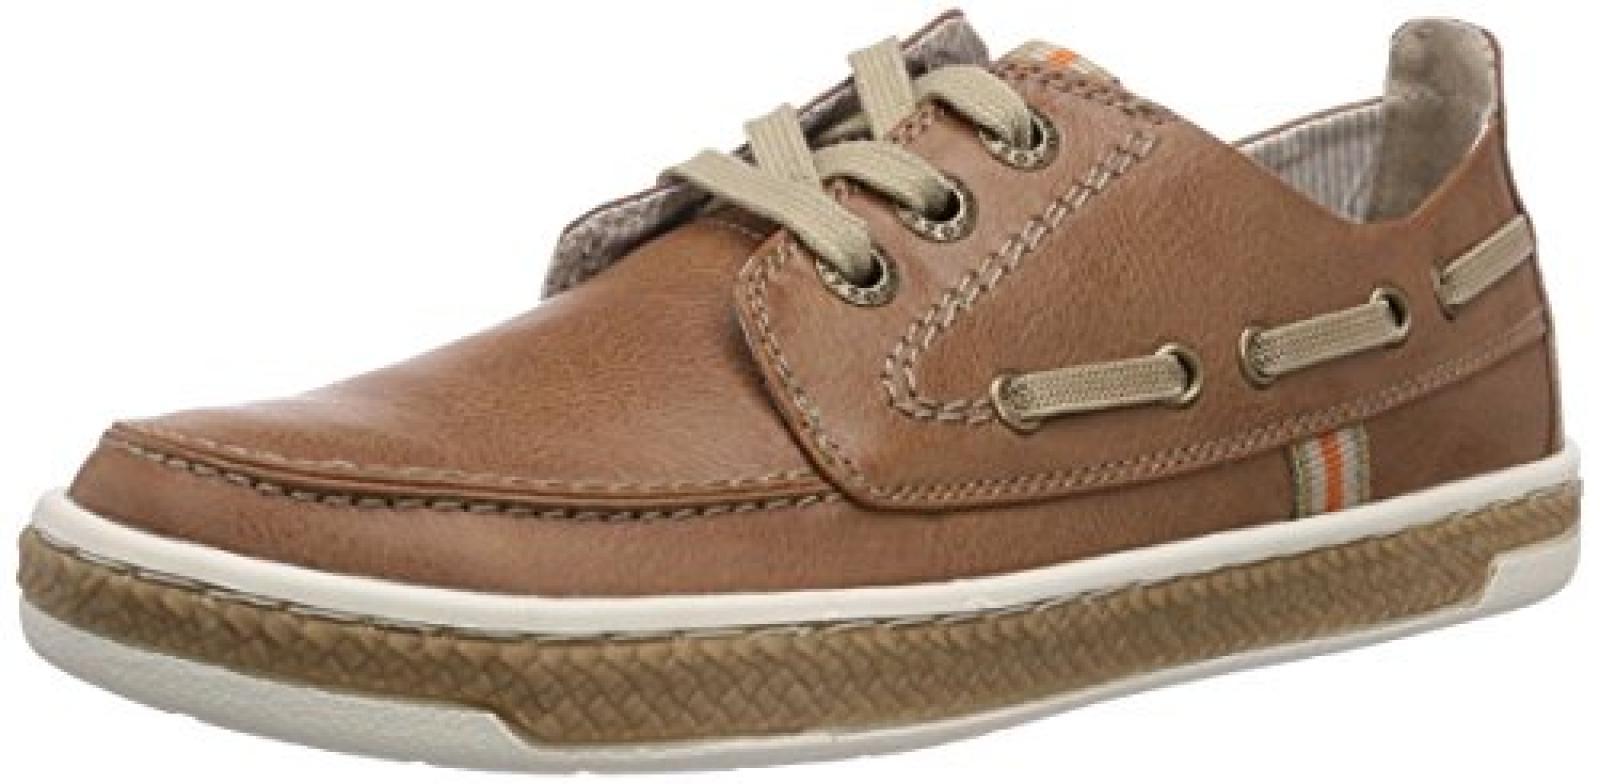 Marco Tozzi 23600 Damen Sneakers